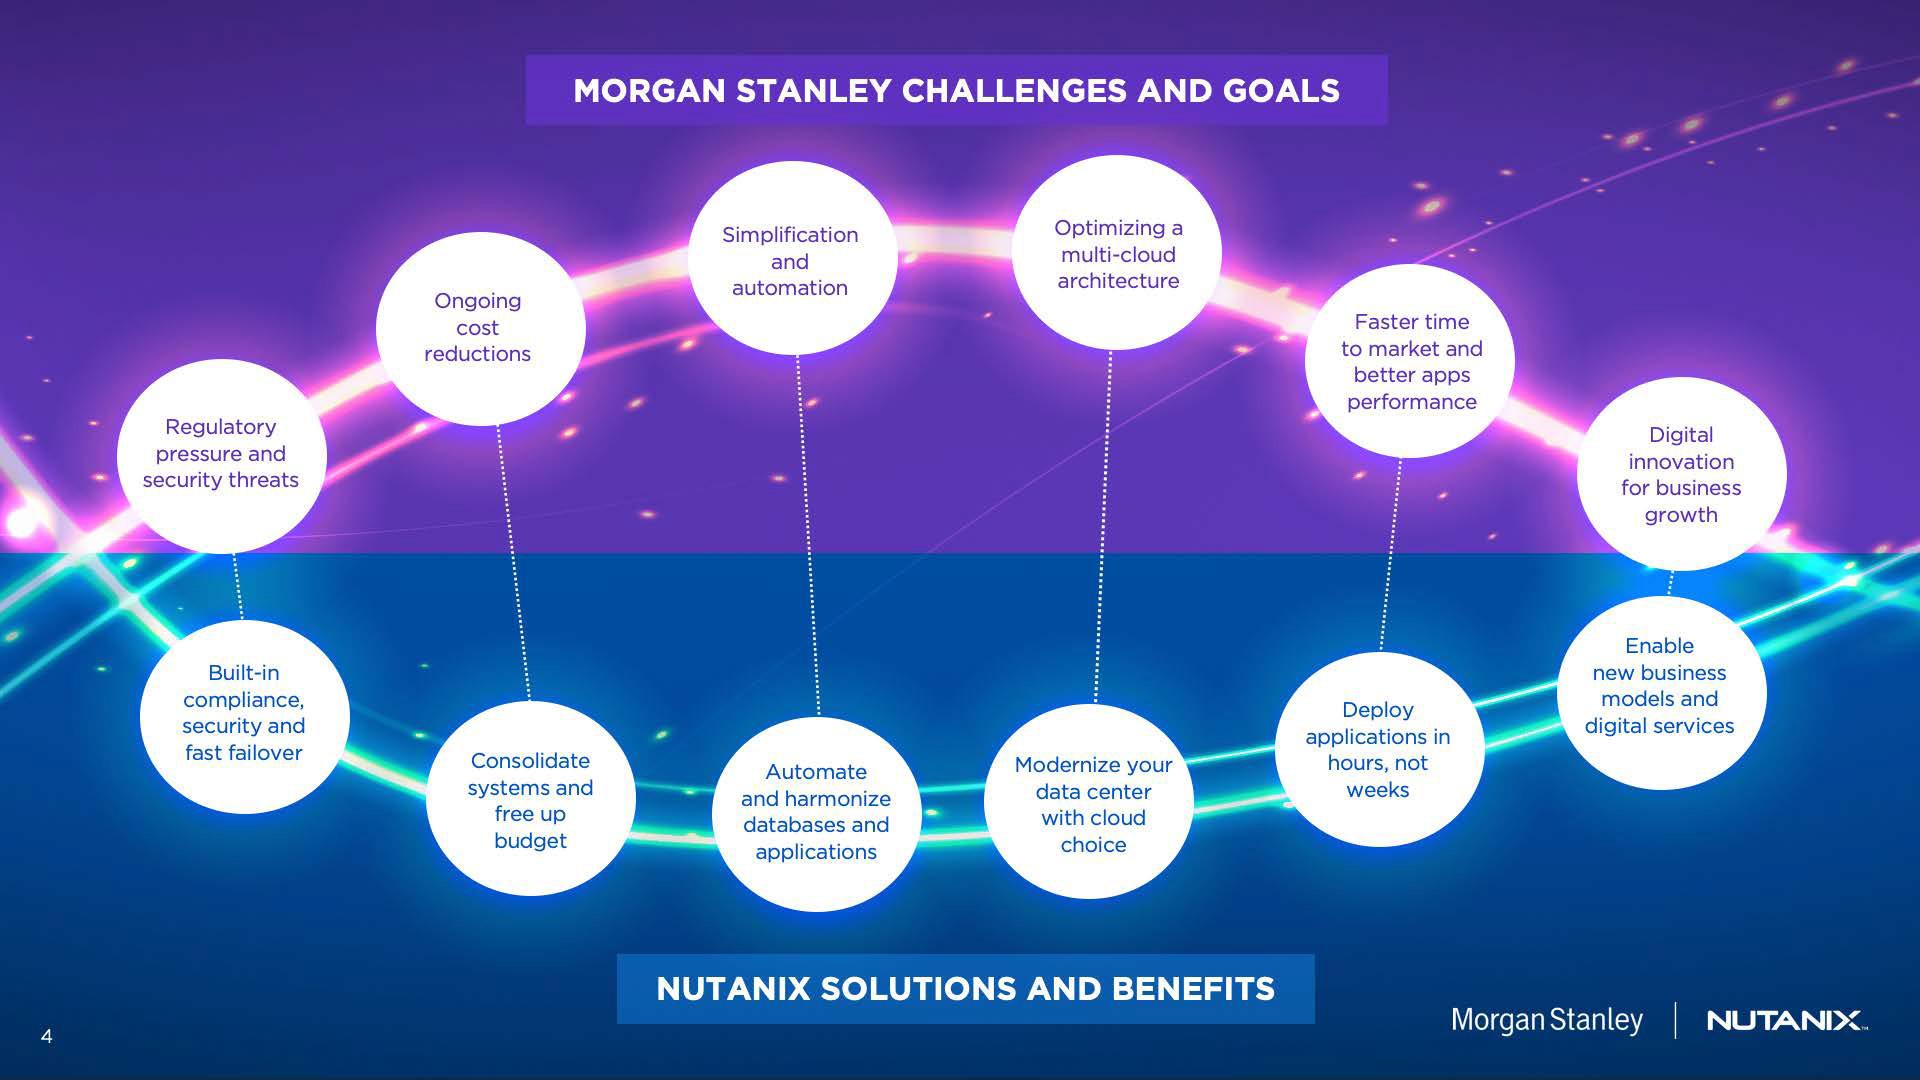 02078_Nutanix_Morgan_Stanley-Presentation_v1.6-4